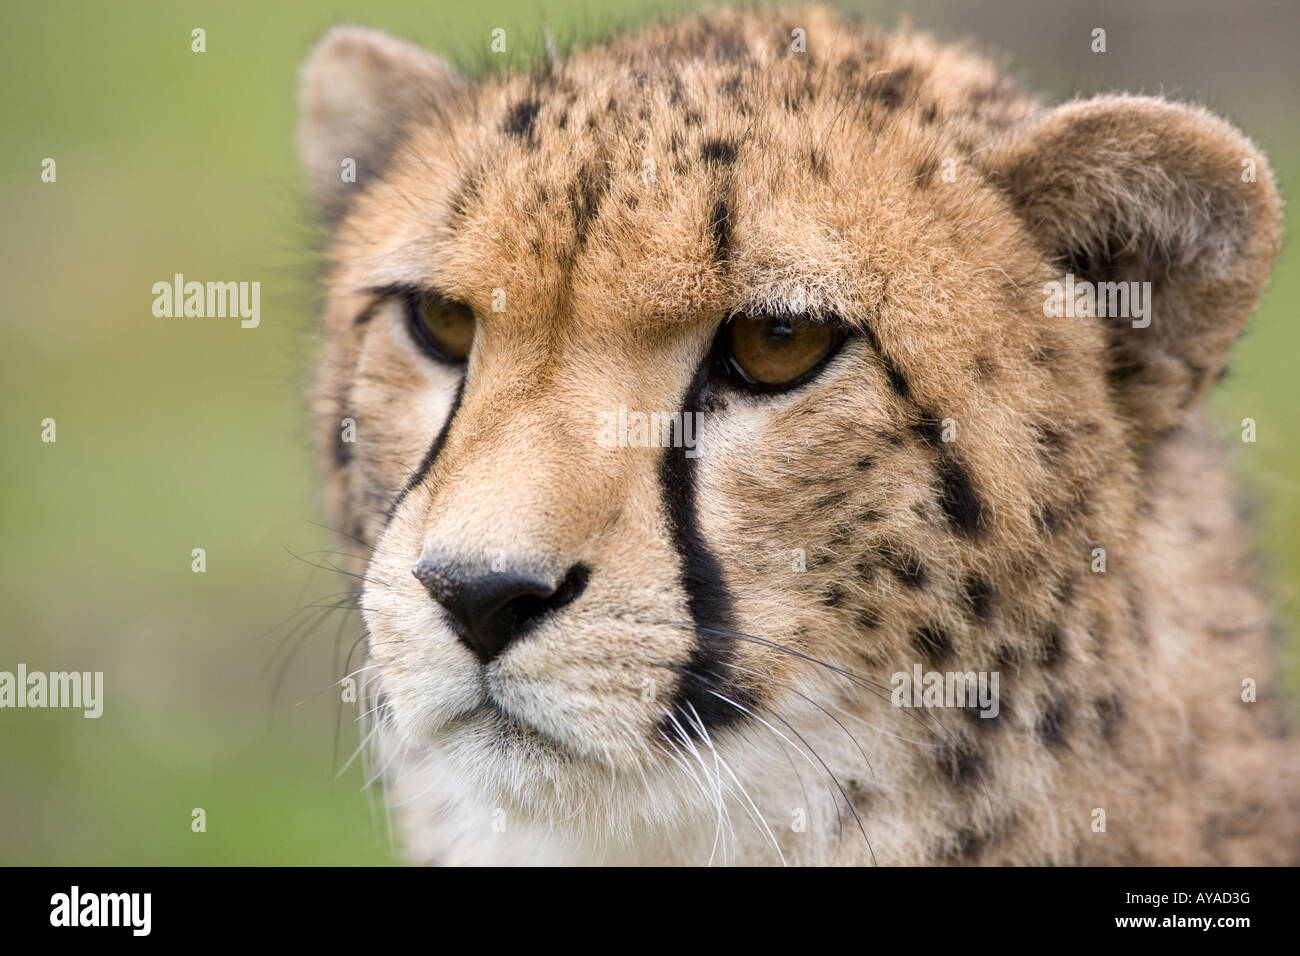 Head of young cheetah - Acinonyx jubatus - Stock Image